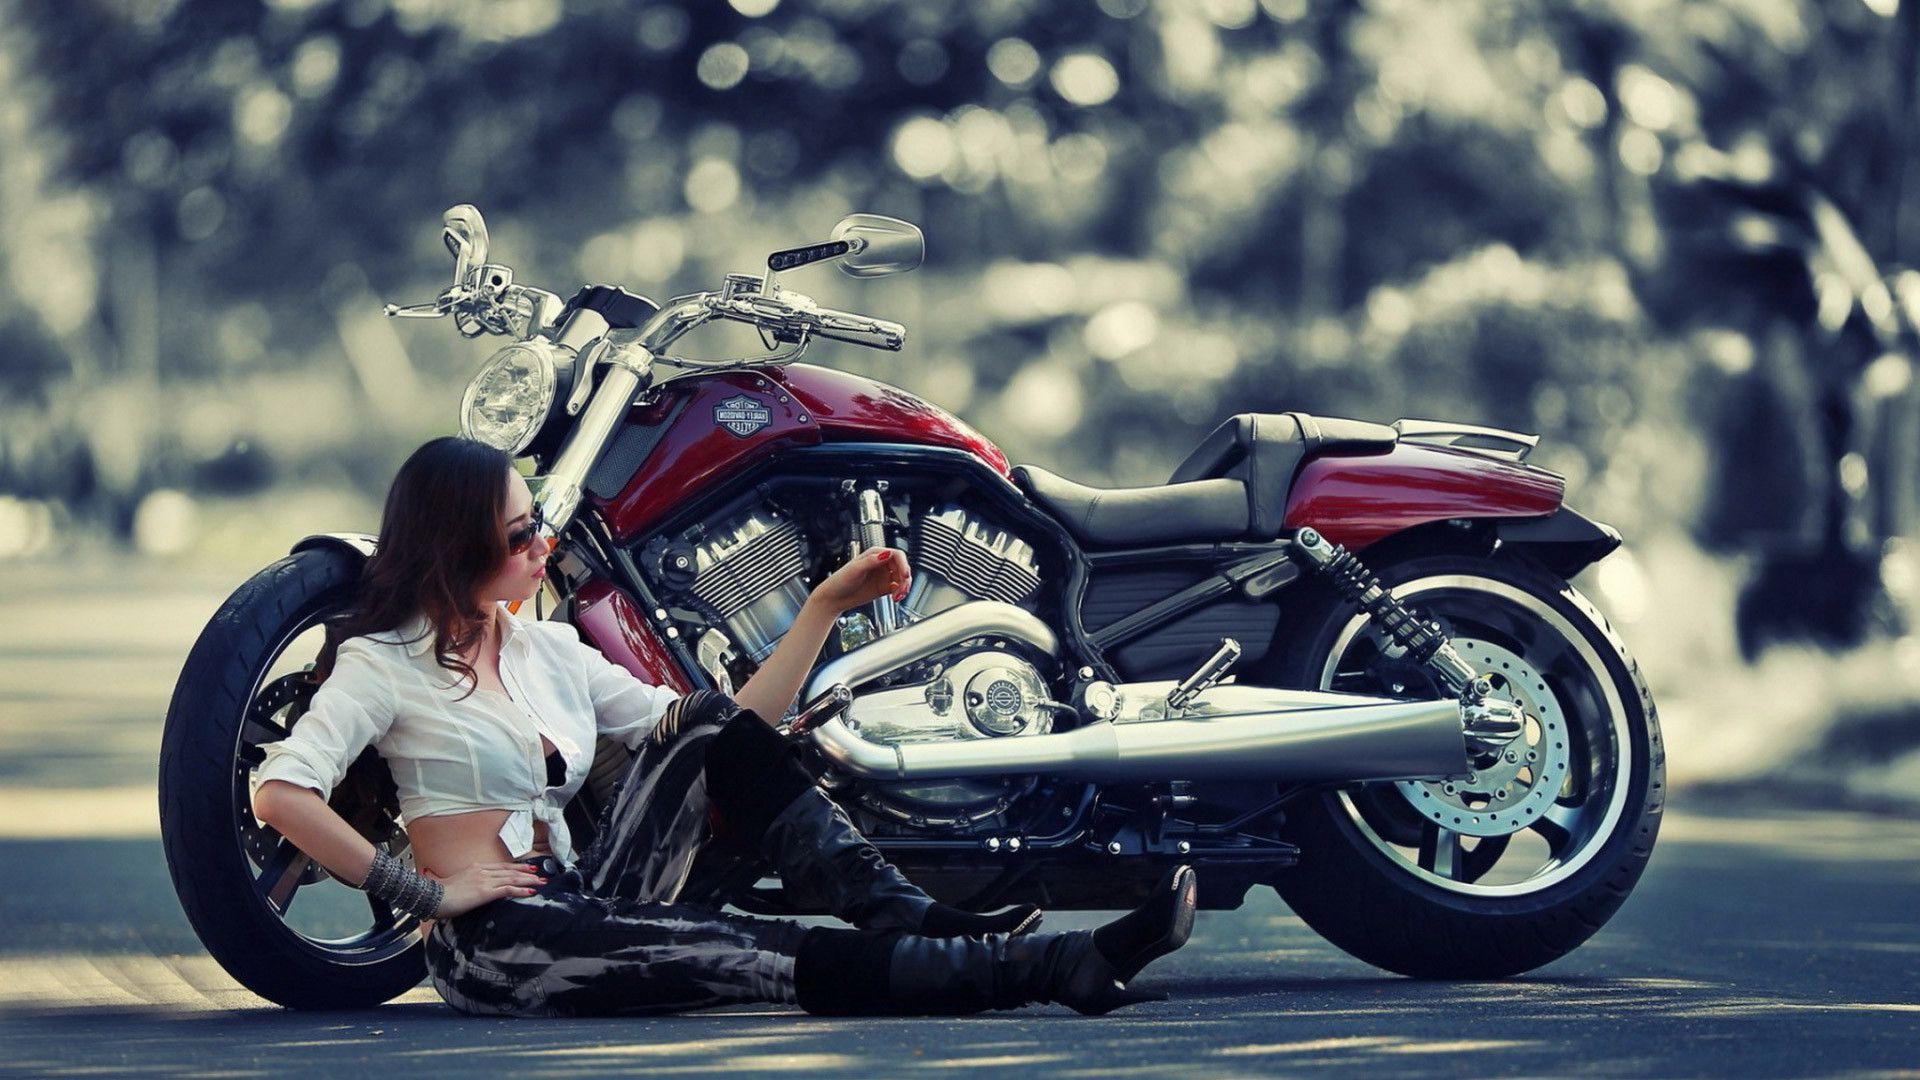 Hd Bike Mobile Wallpapers Harley Davidson Wallpaper Harley Davidson Motorcycles Harley Davidson Bikes